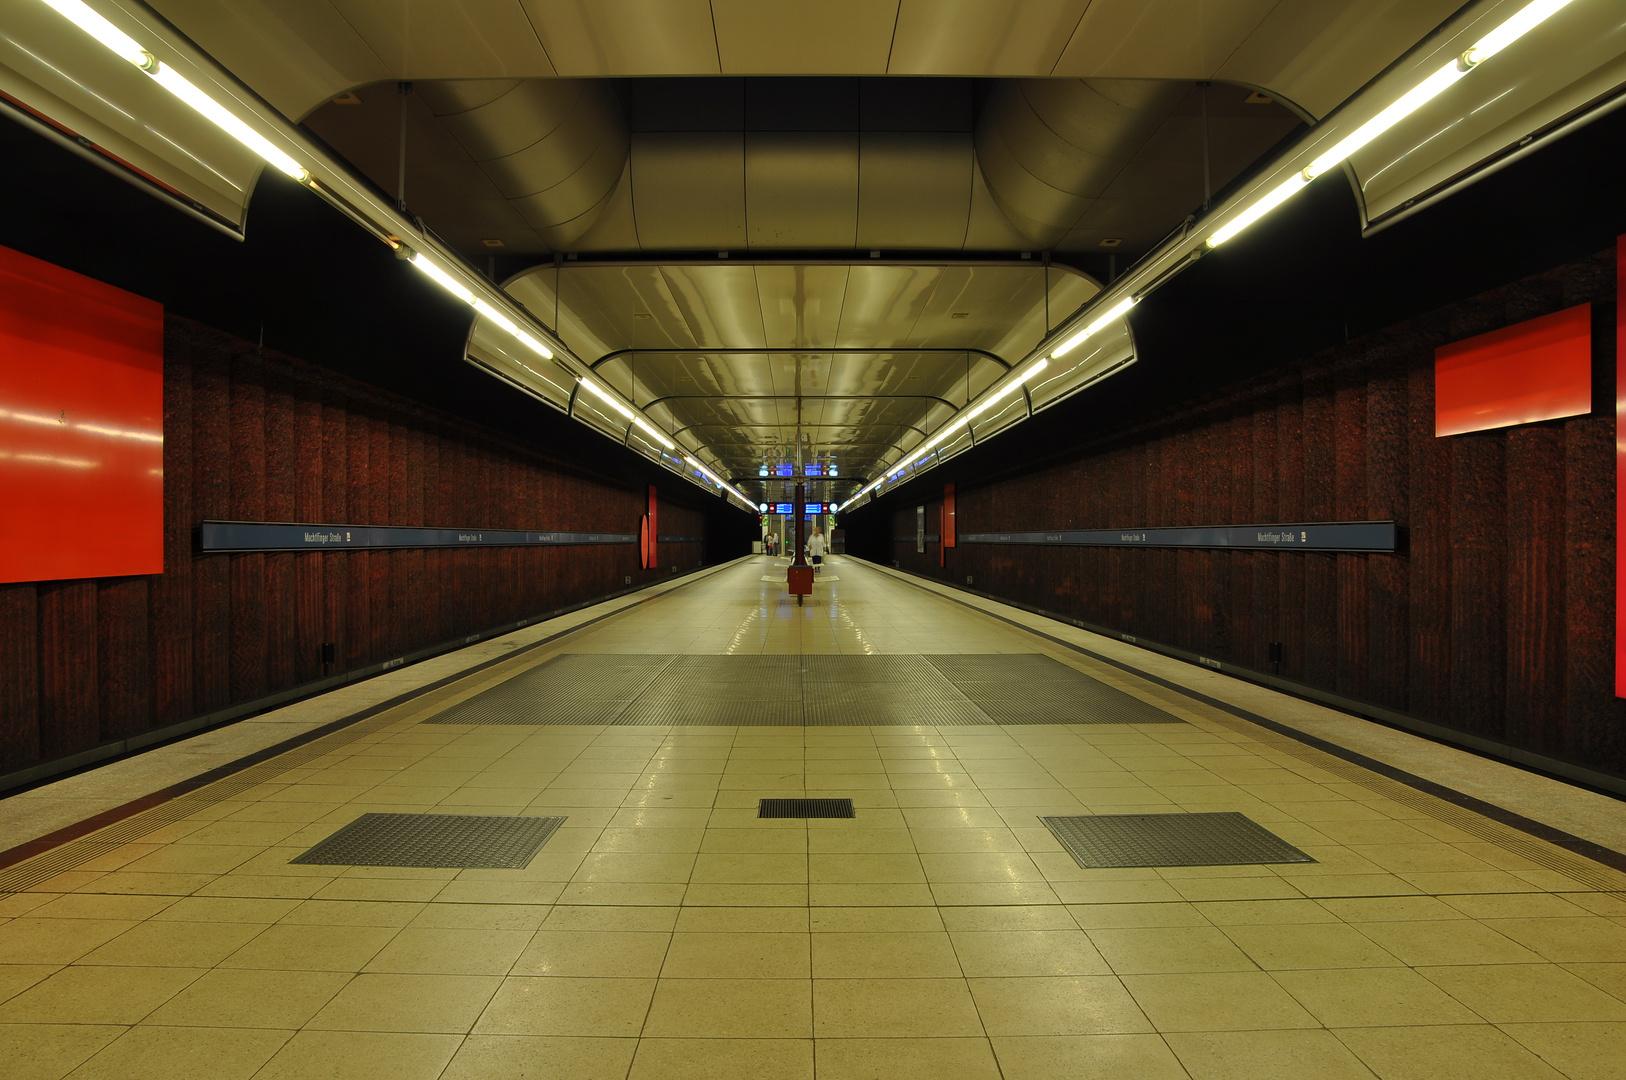 U-Bahn München Machtlfinger Str. I Foto & Bild